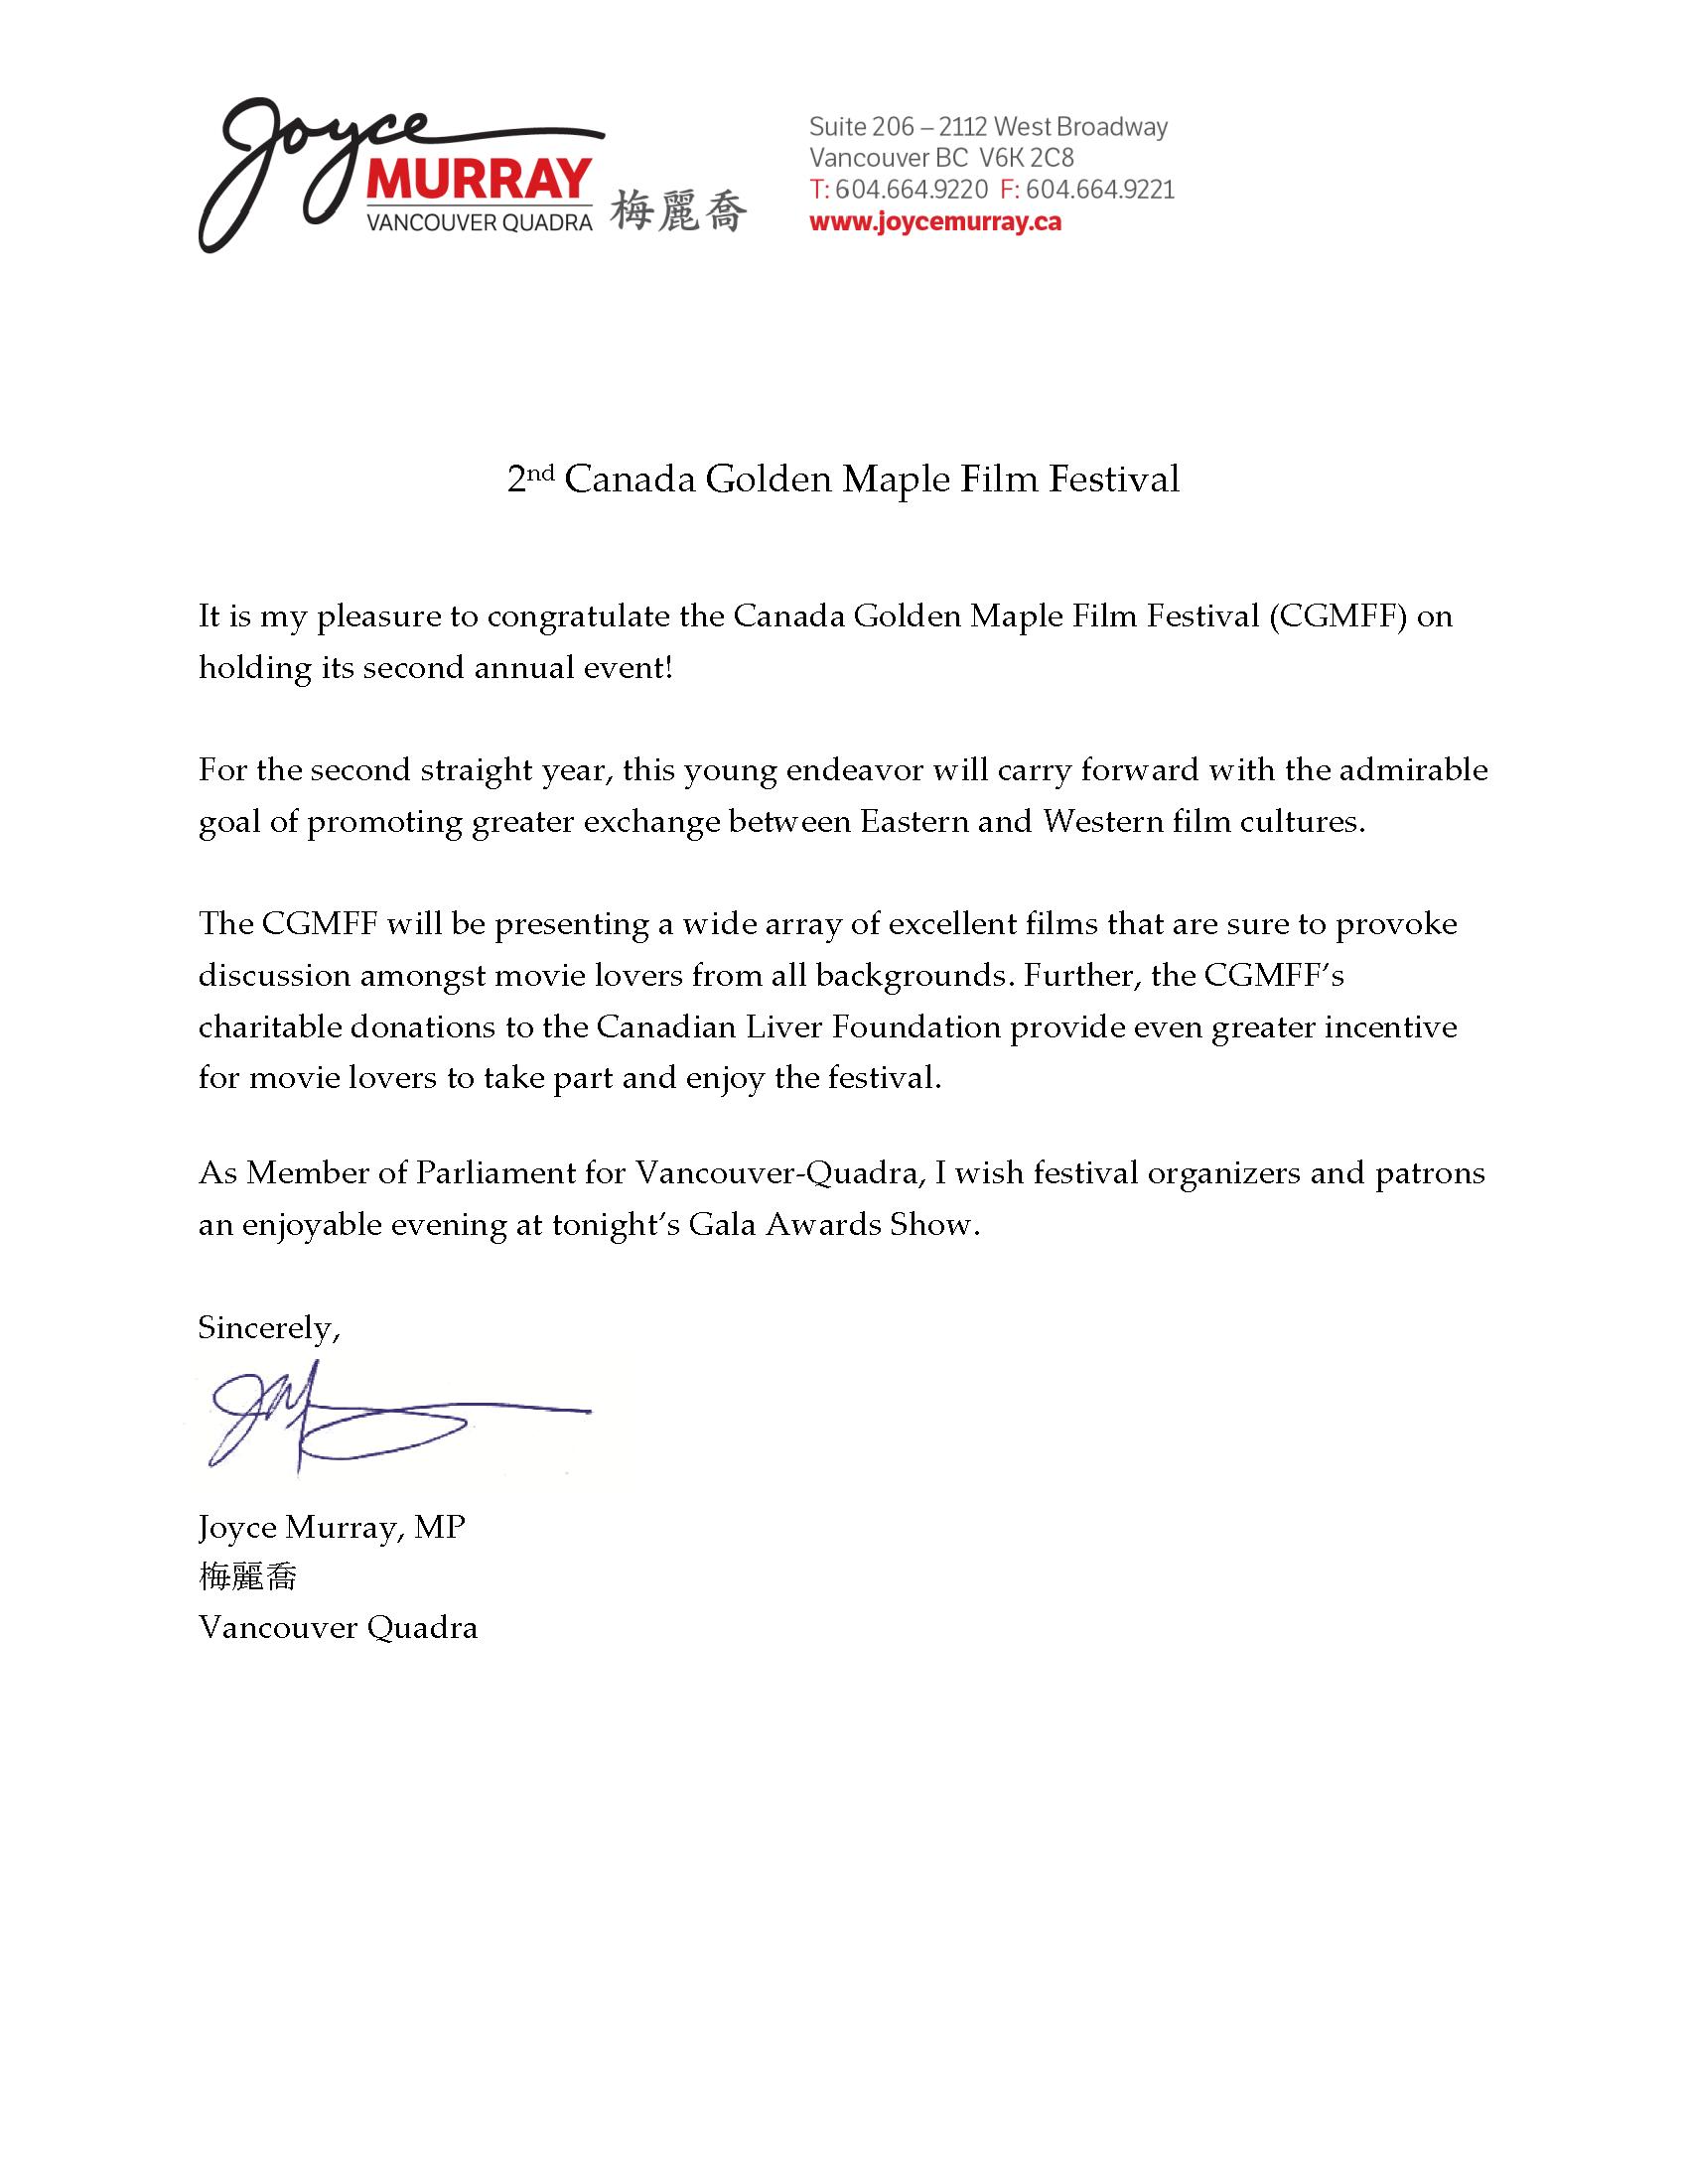 Congratulatory Letter from Joyce Murray, Federal Member of Parliament